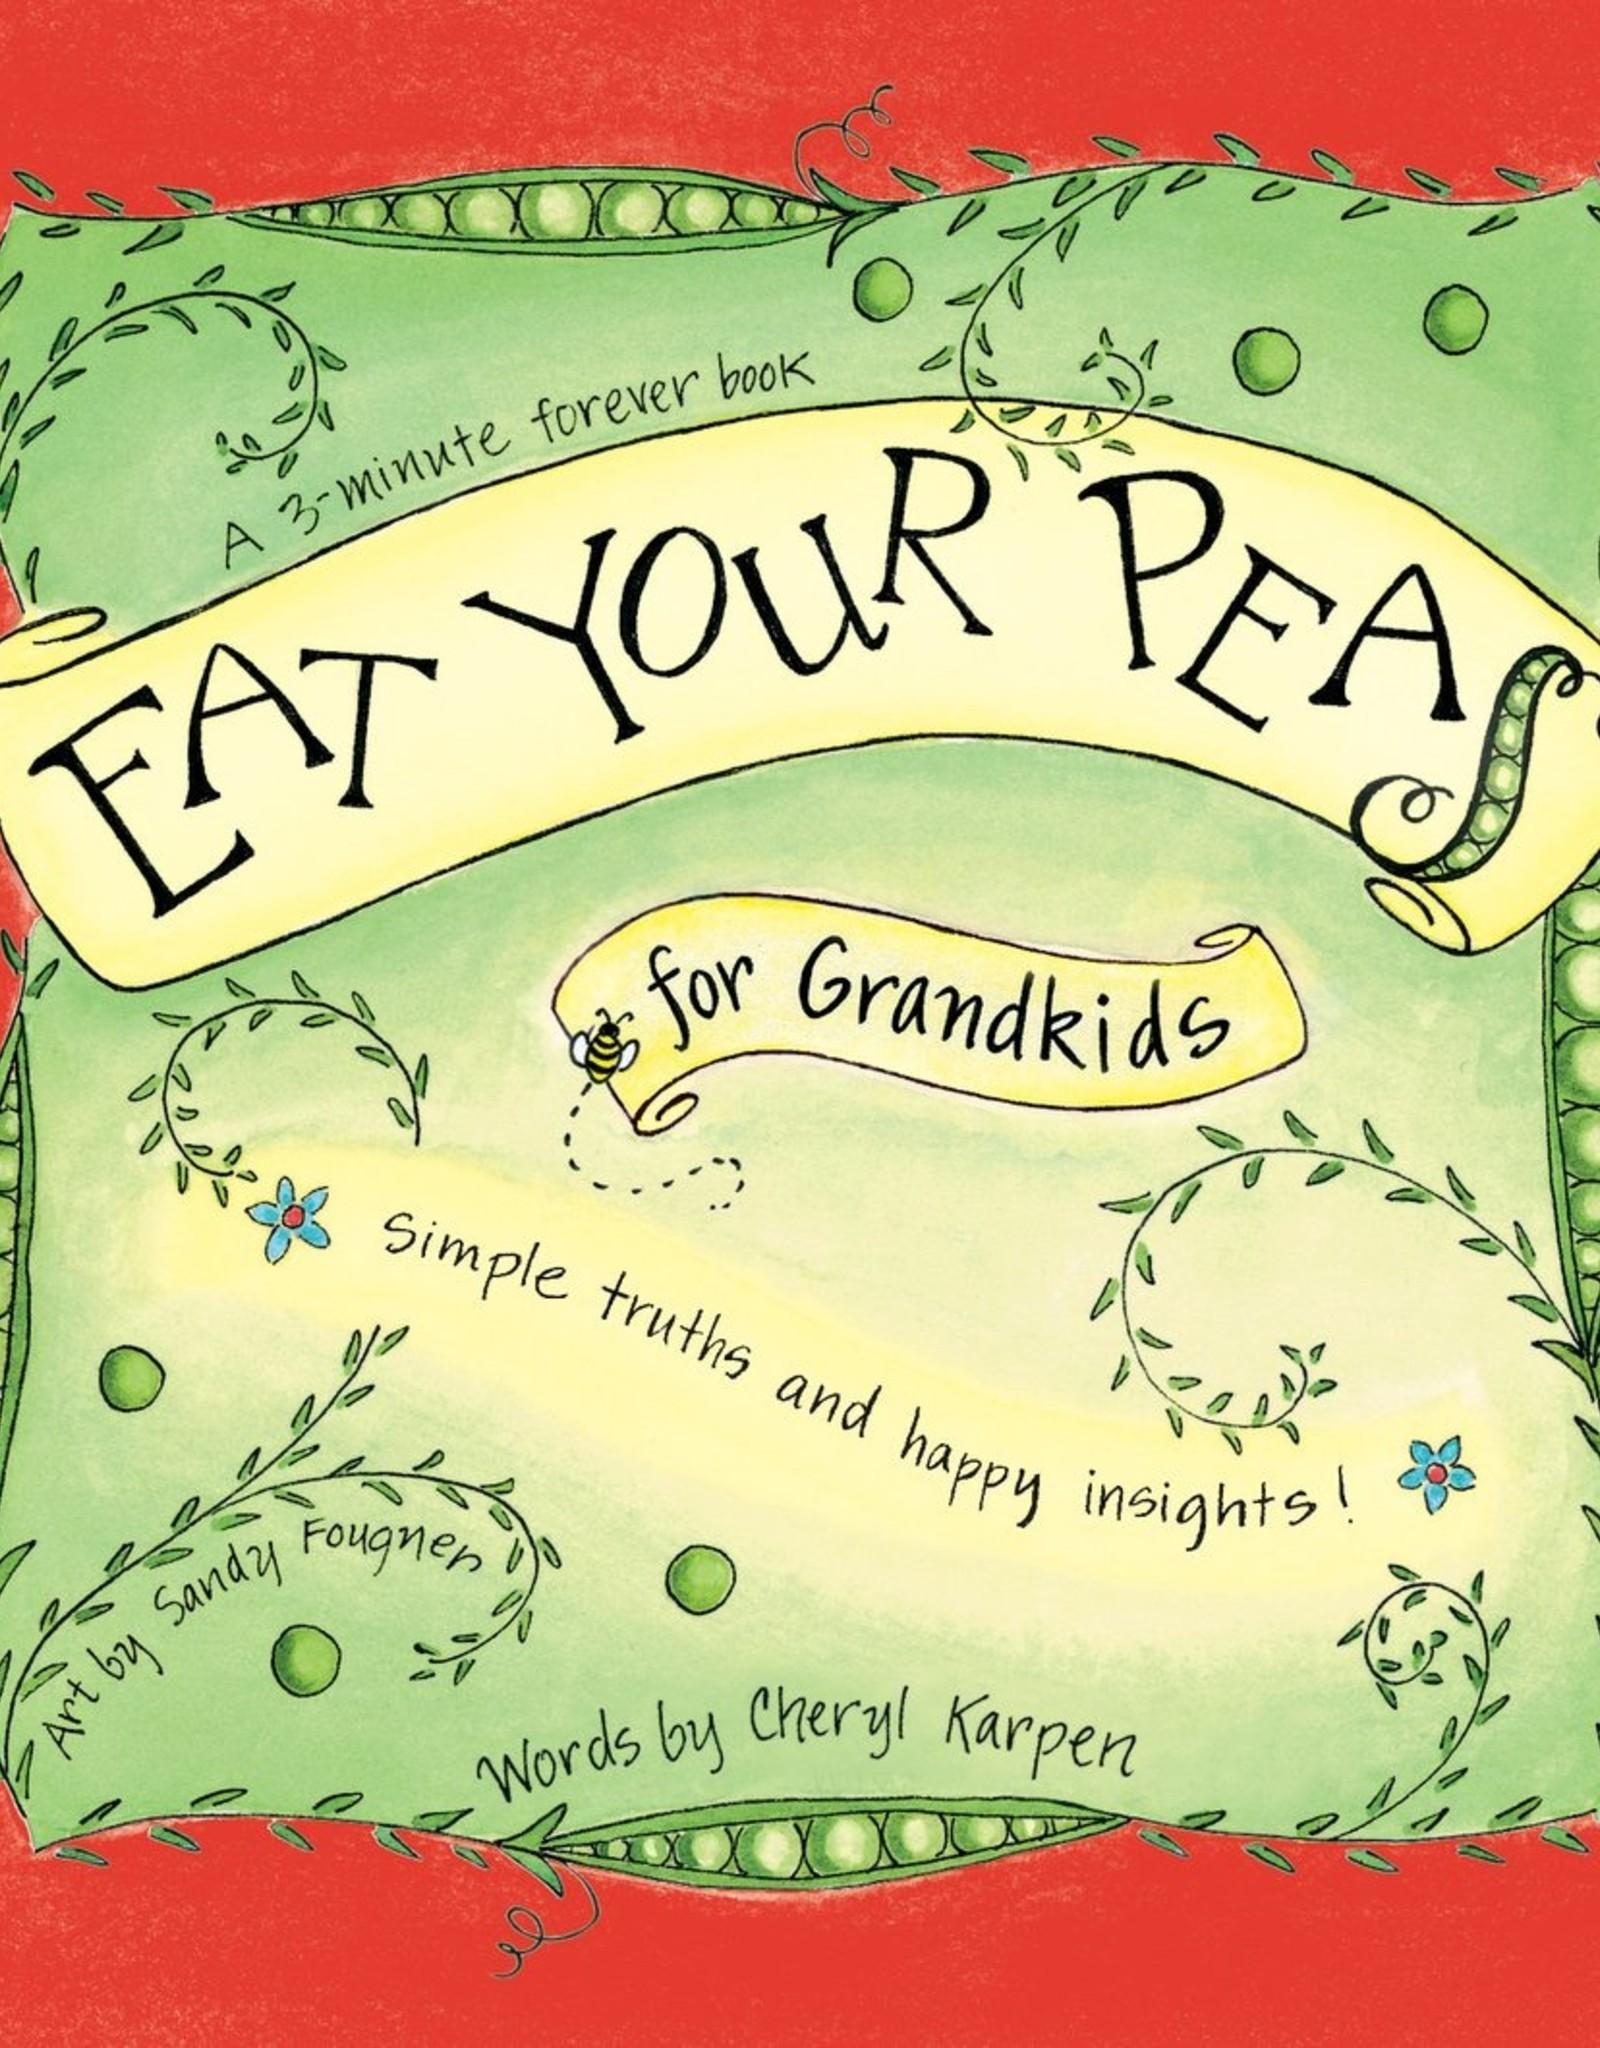 Gently Spoken Eat Your Peas for Grandkids